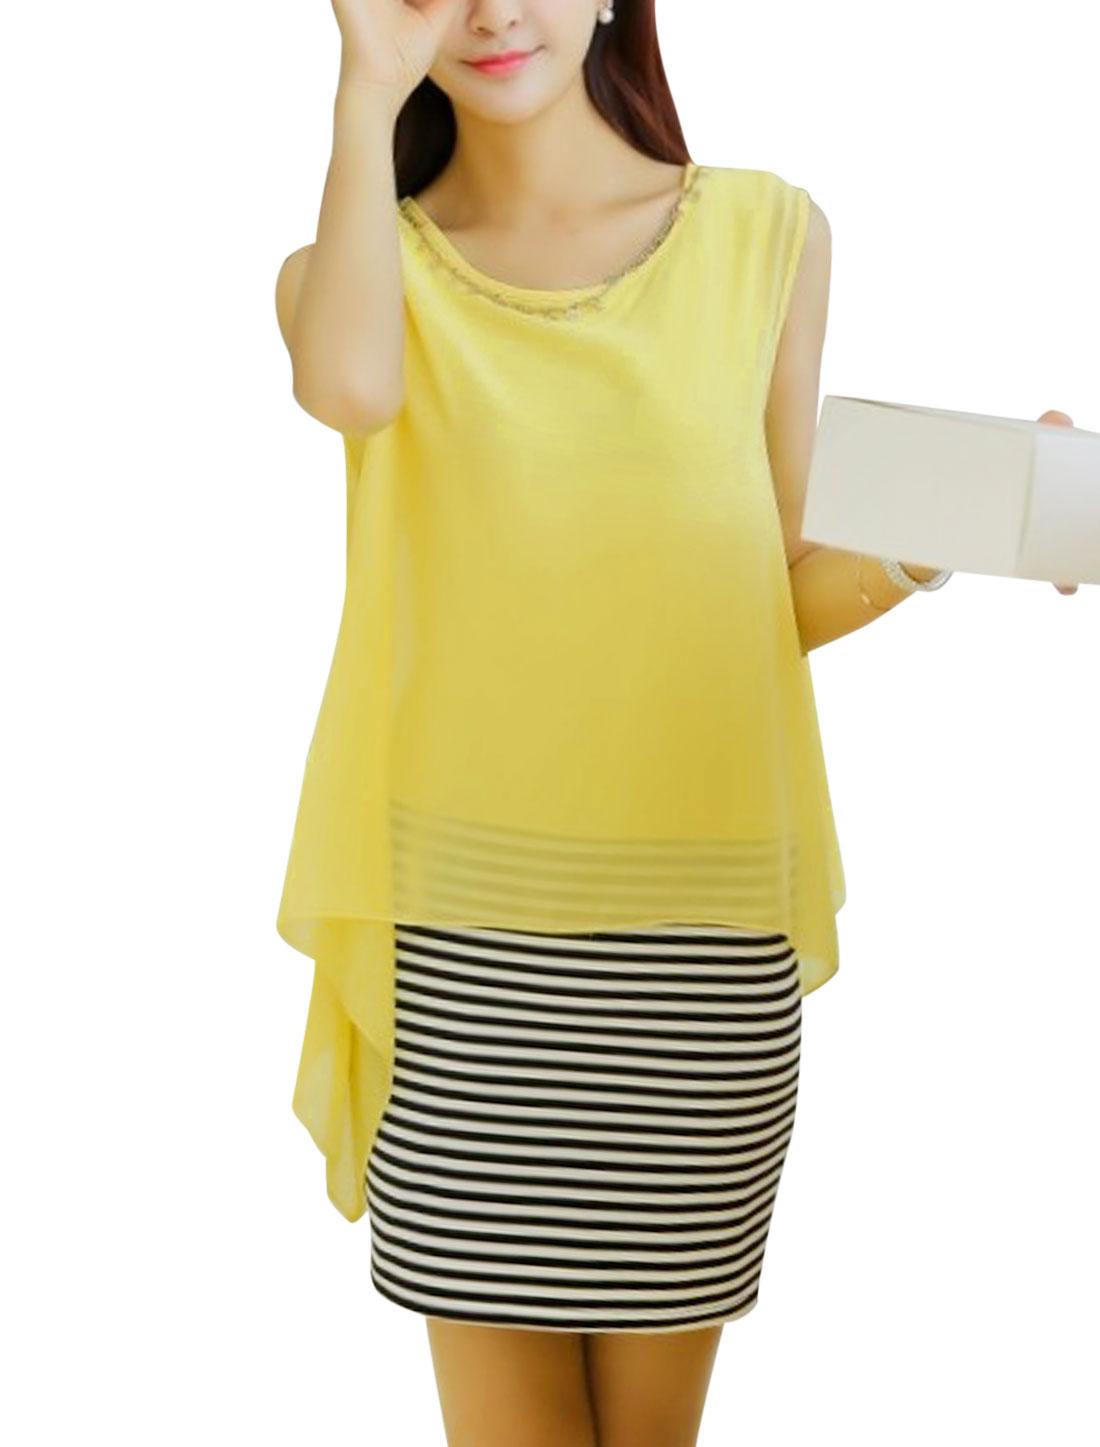 Women Yellow Chiffon Patchowrk Sleeveless Above Knee Straight Dress w Necklace M